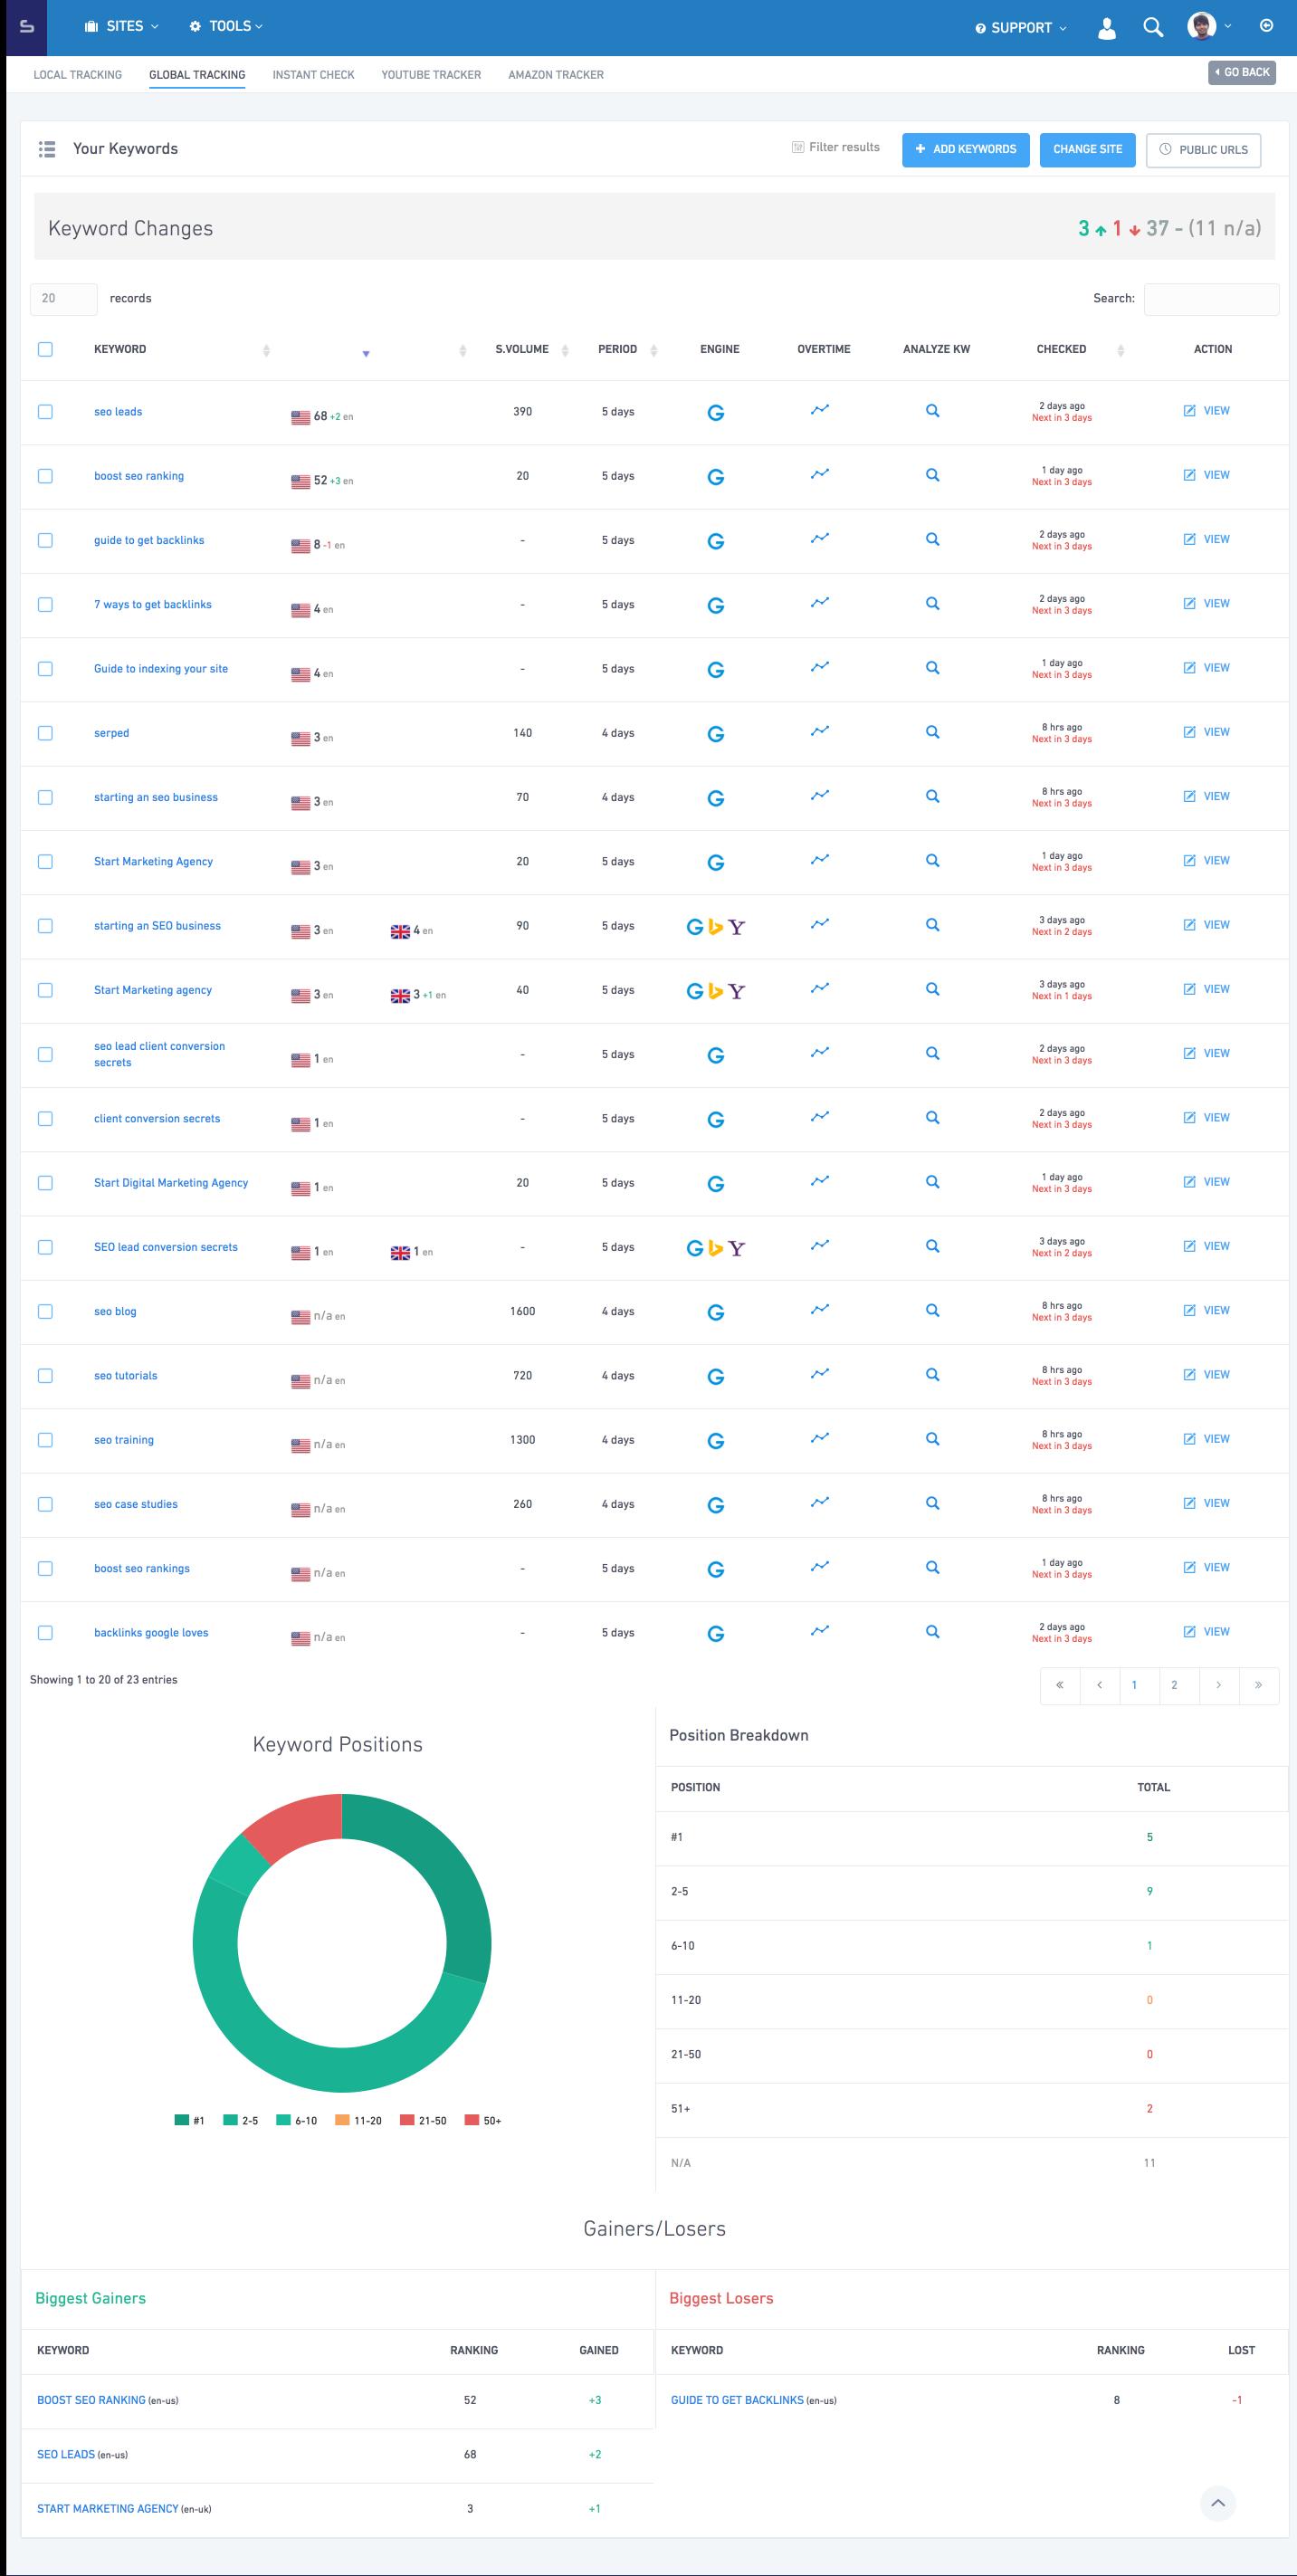 data and metrics 'Global Tracker'